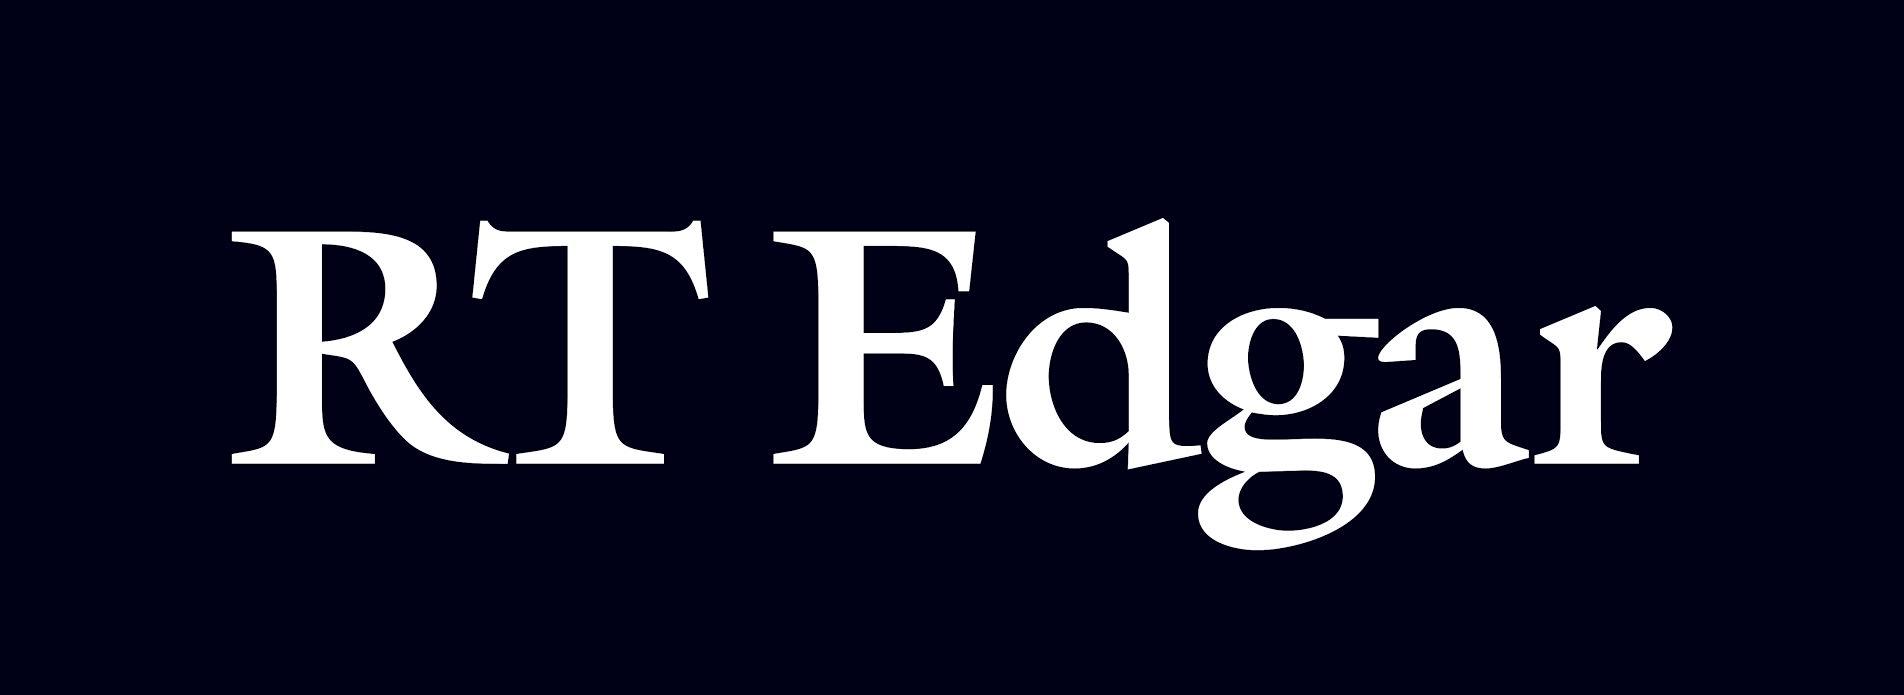 RT Edgar.jpg